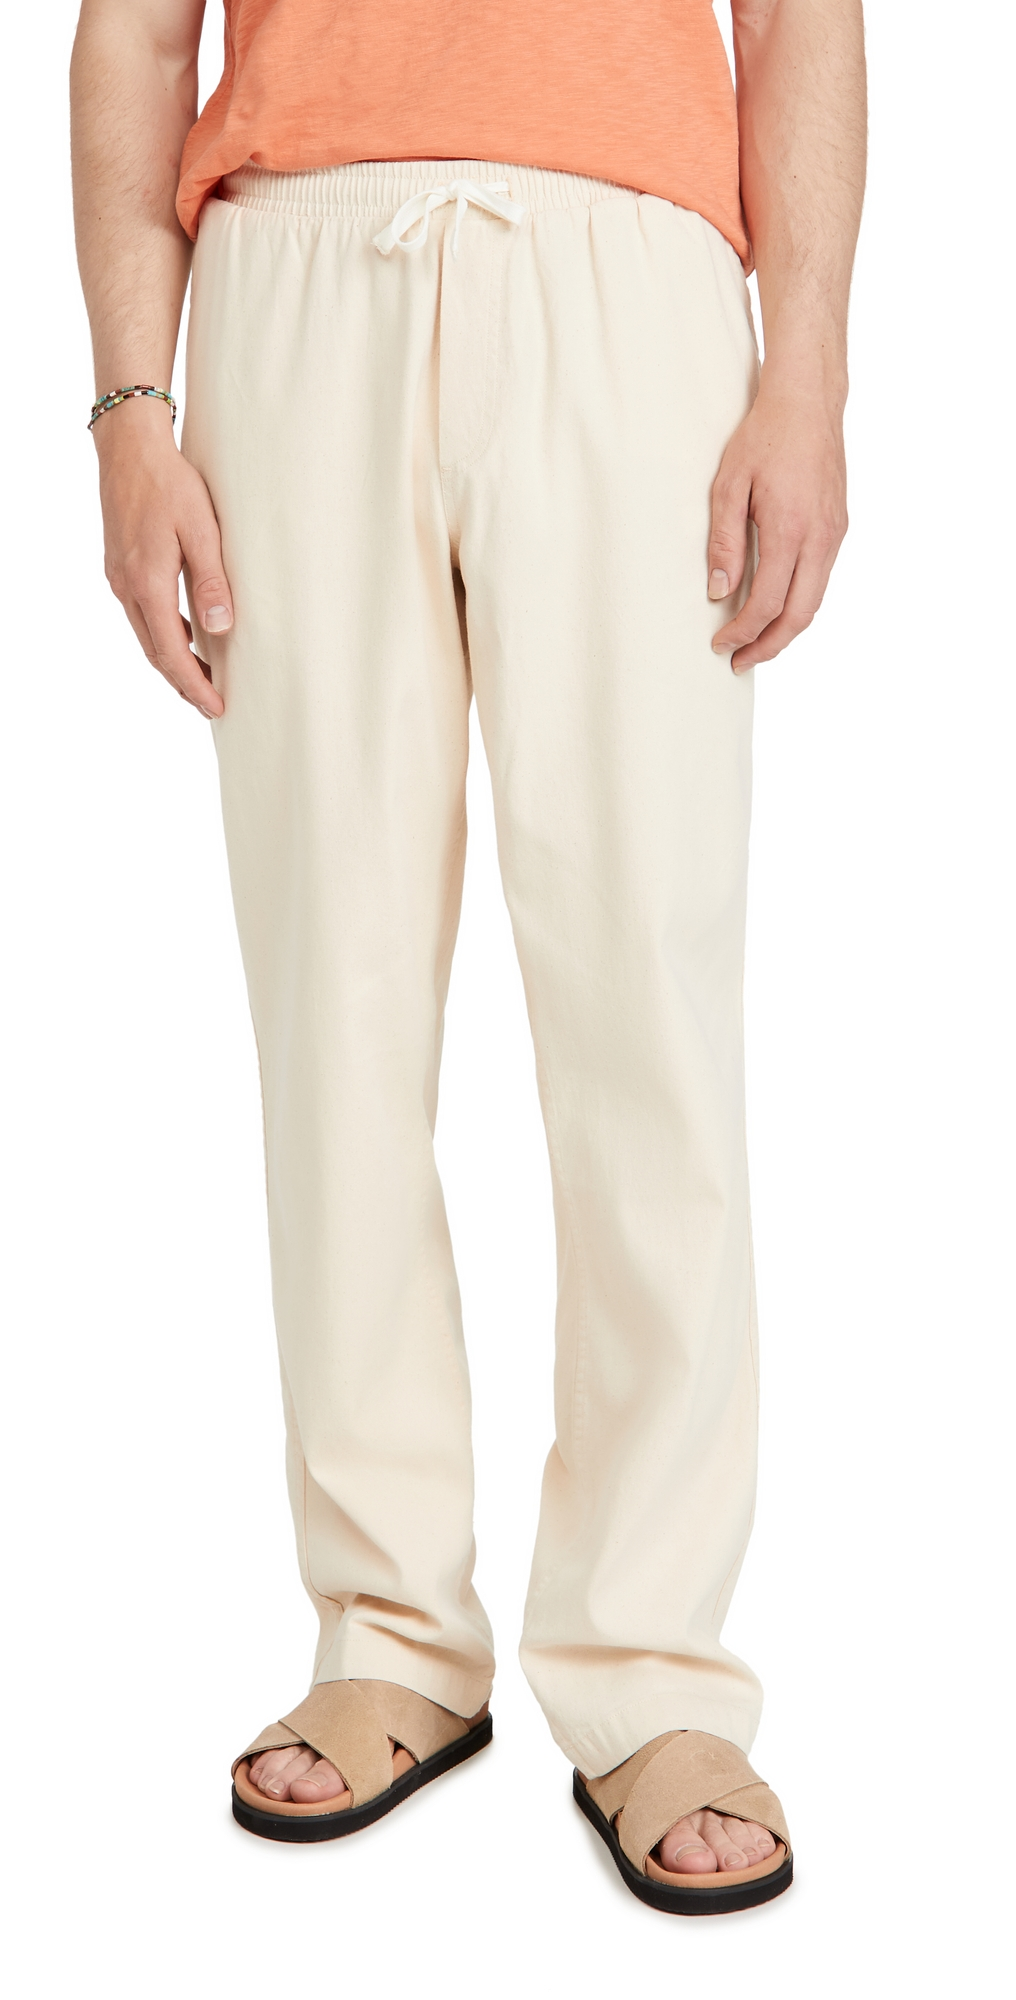 Cotton Seed Drawstring Pants